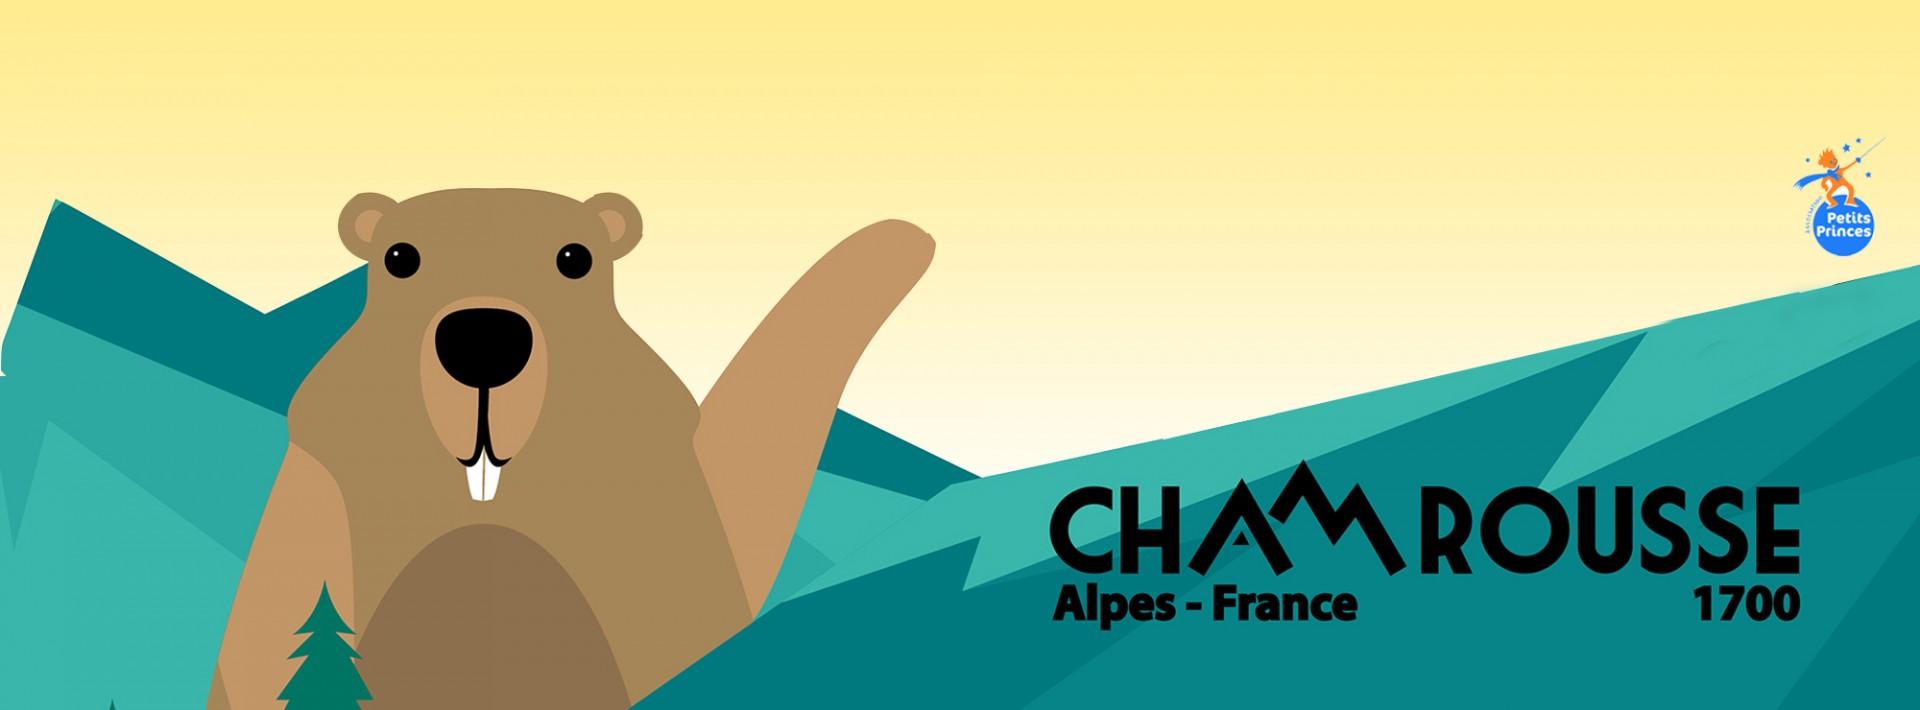 chamrousse-semaine-petits-montagn-arts-station-montagne-isere-alpes-france-slider-2713